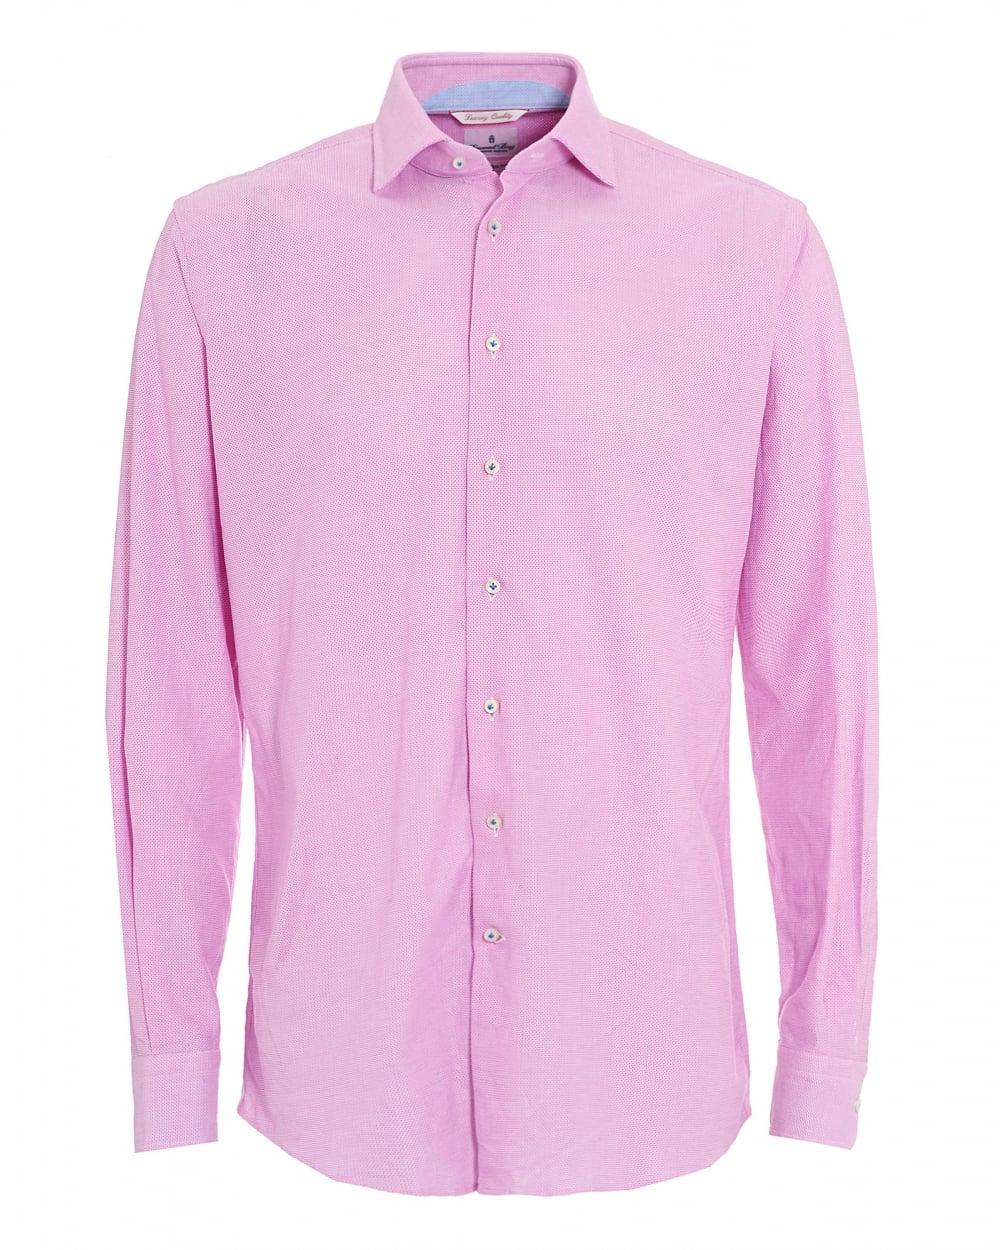 Emanuel berg mens pink micro diamond airtex cotton shirt for Mens pink shirts uk